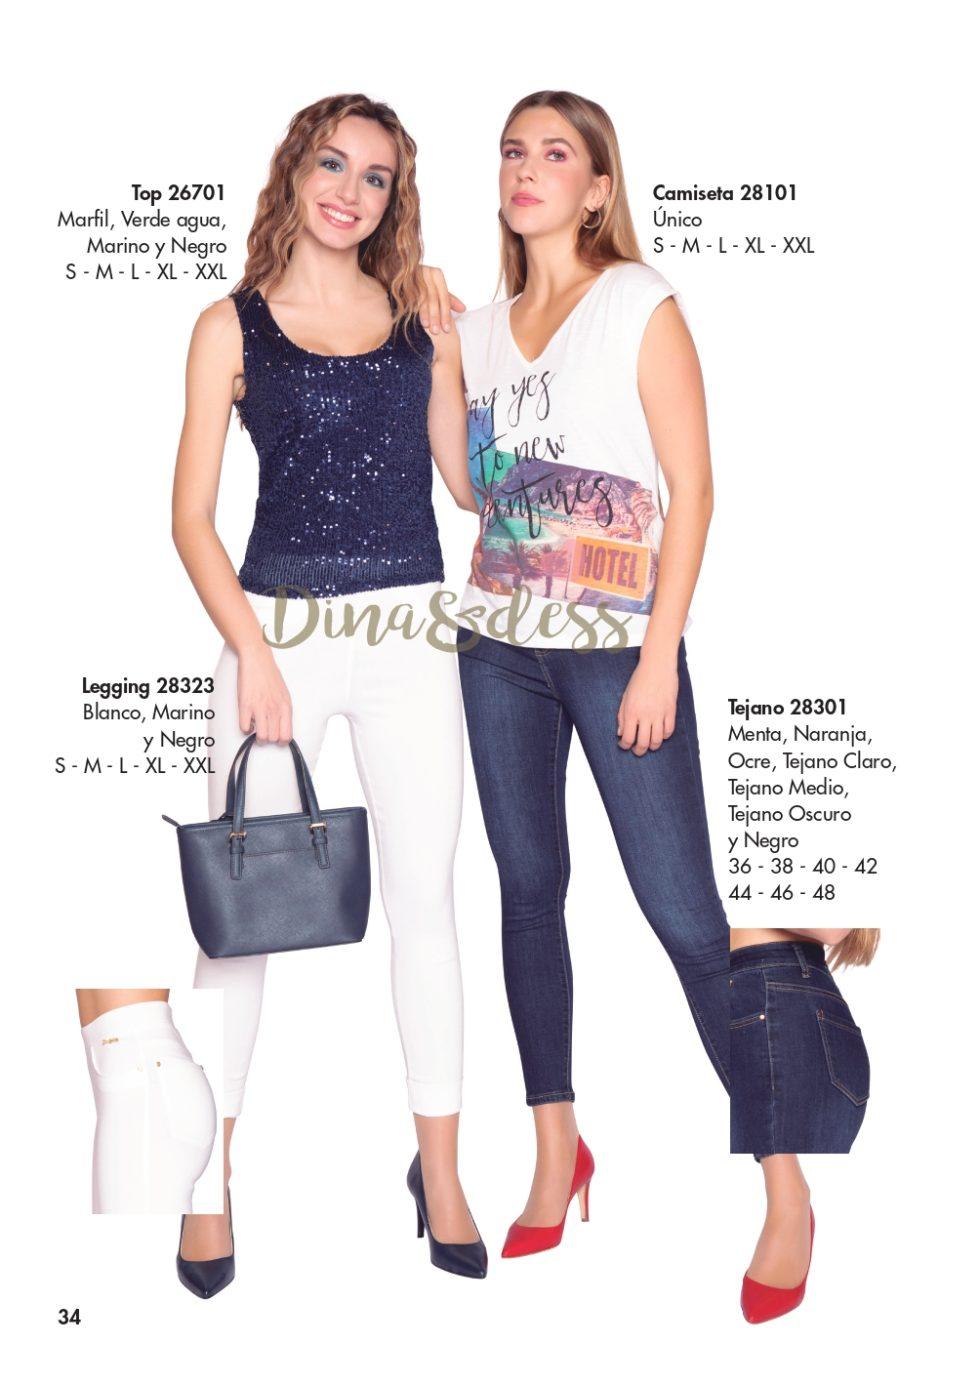 Verano 2021 Dina&Dess Clientes_page-0036